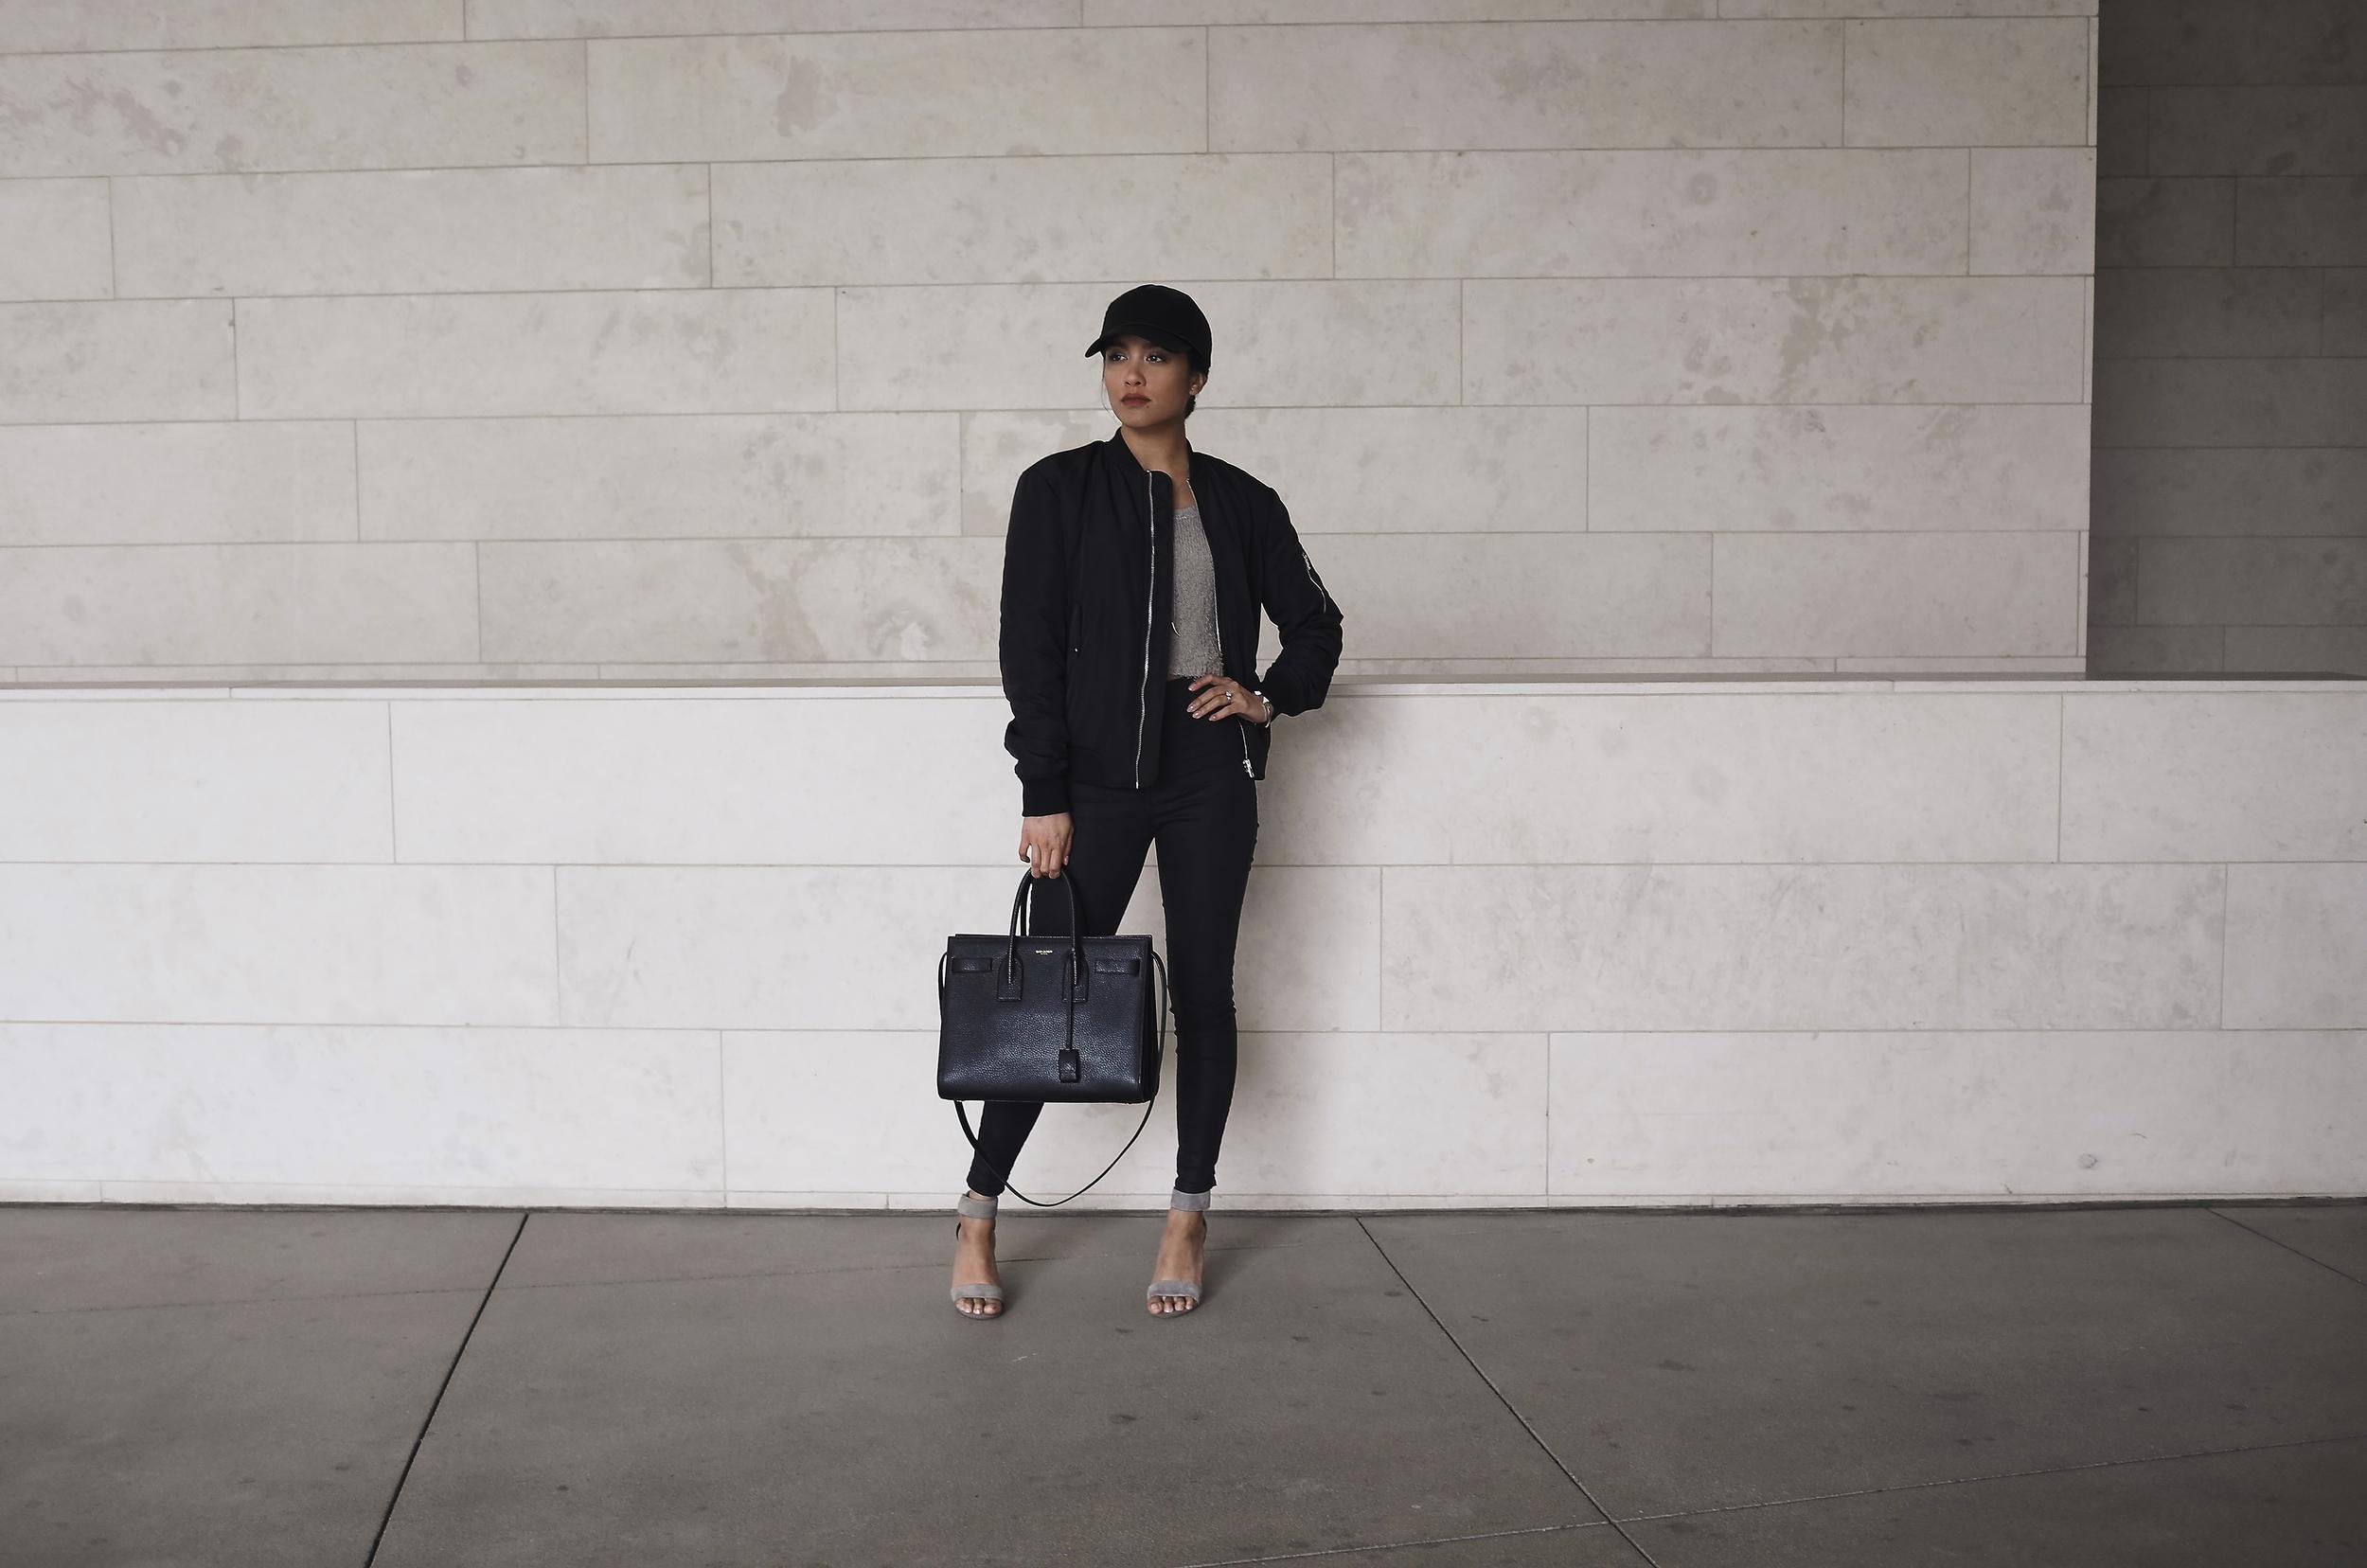 zara bomber (  s.  )| minkpink top (  s.  ) | topshop   jeans   | j.campbell   heels   | UO   cap   |ysl   bag   | j.storm   necklace                             photos shot by    michael alvarado    & edited by    sean martin